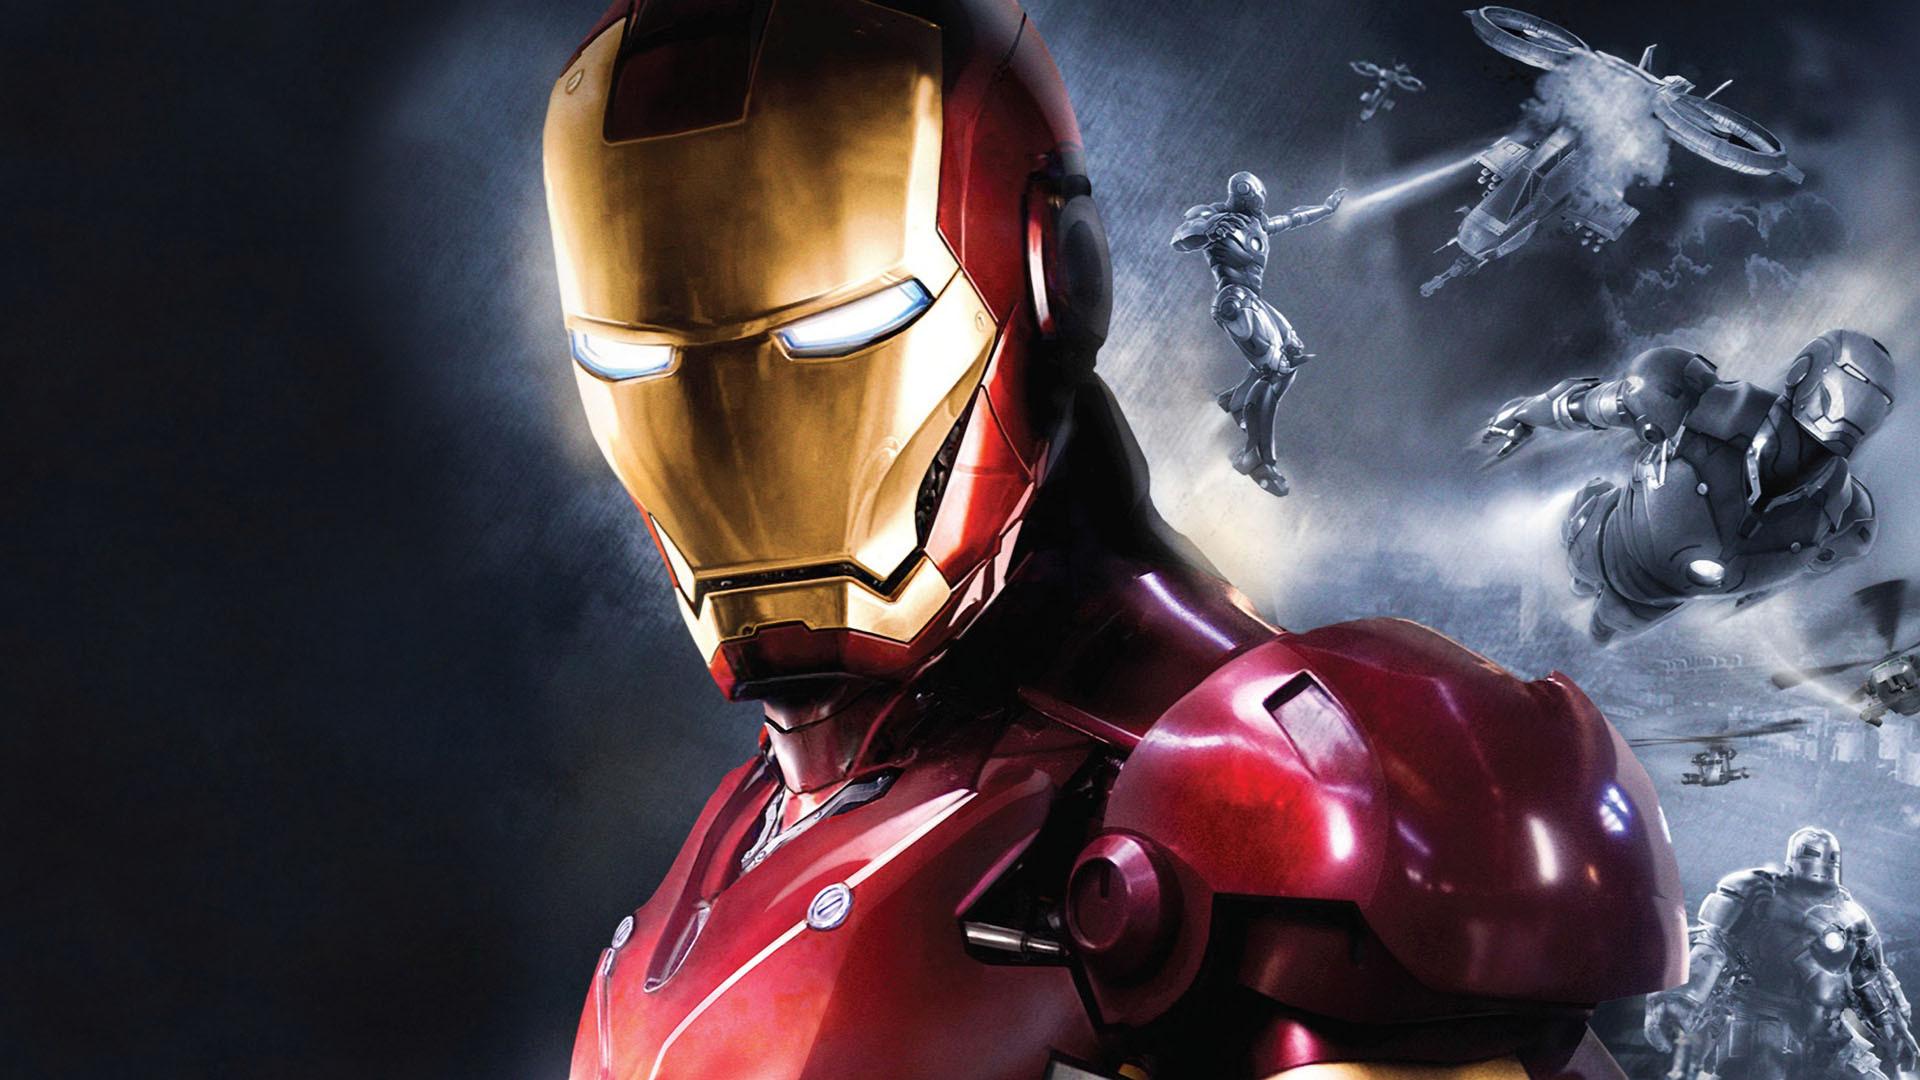 Iron Man 2 Hd Wallpaper Sf Wallpaper